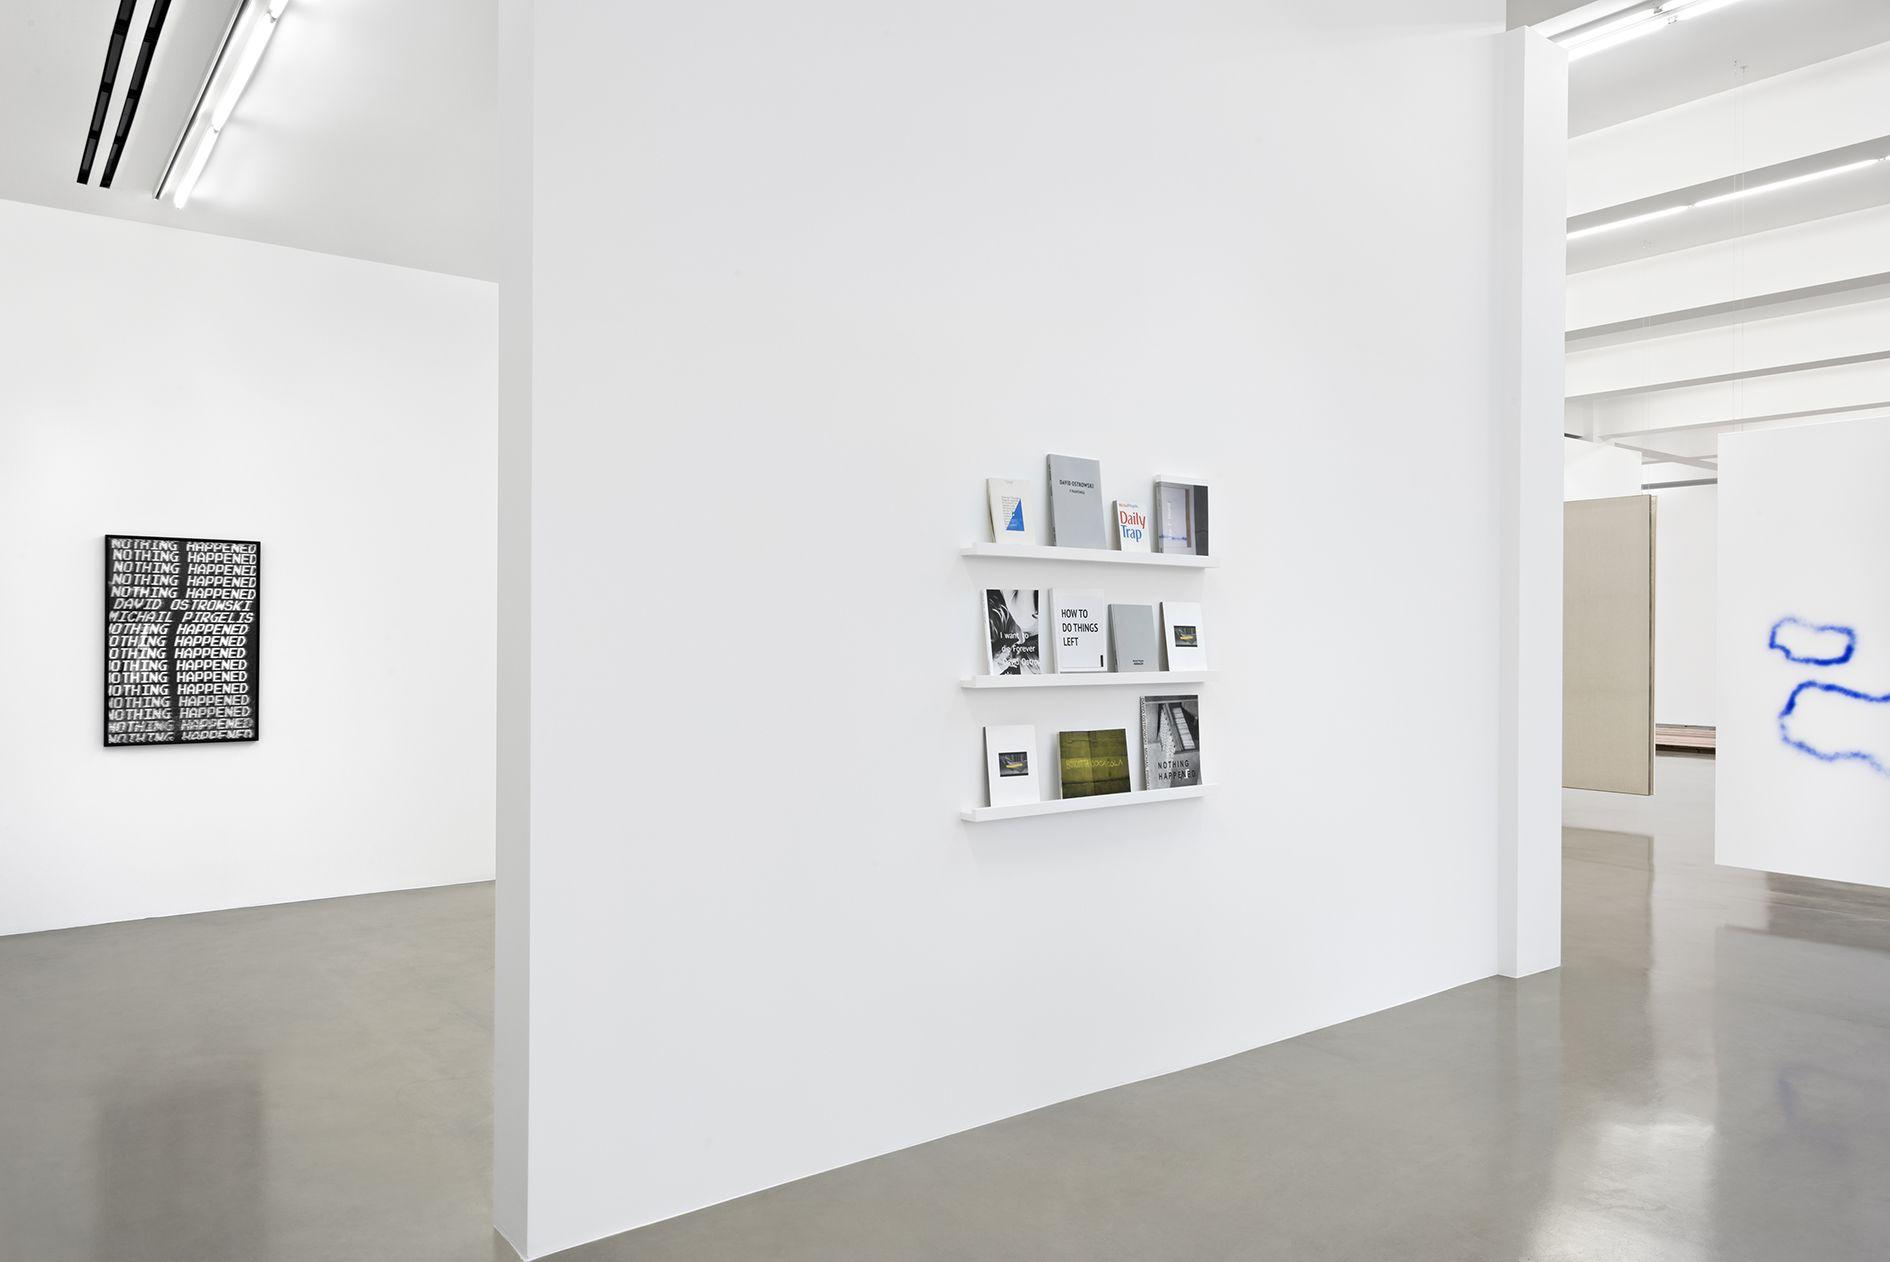 Michail Pirgelis, David Ostrowski – Nothing Happened – Los Angeles